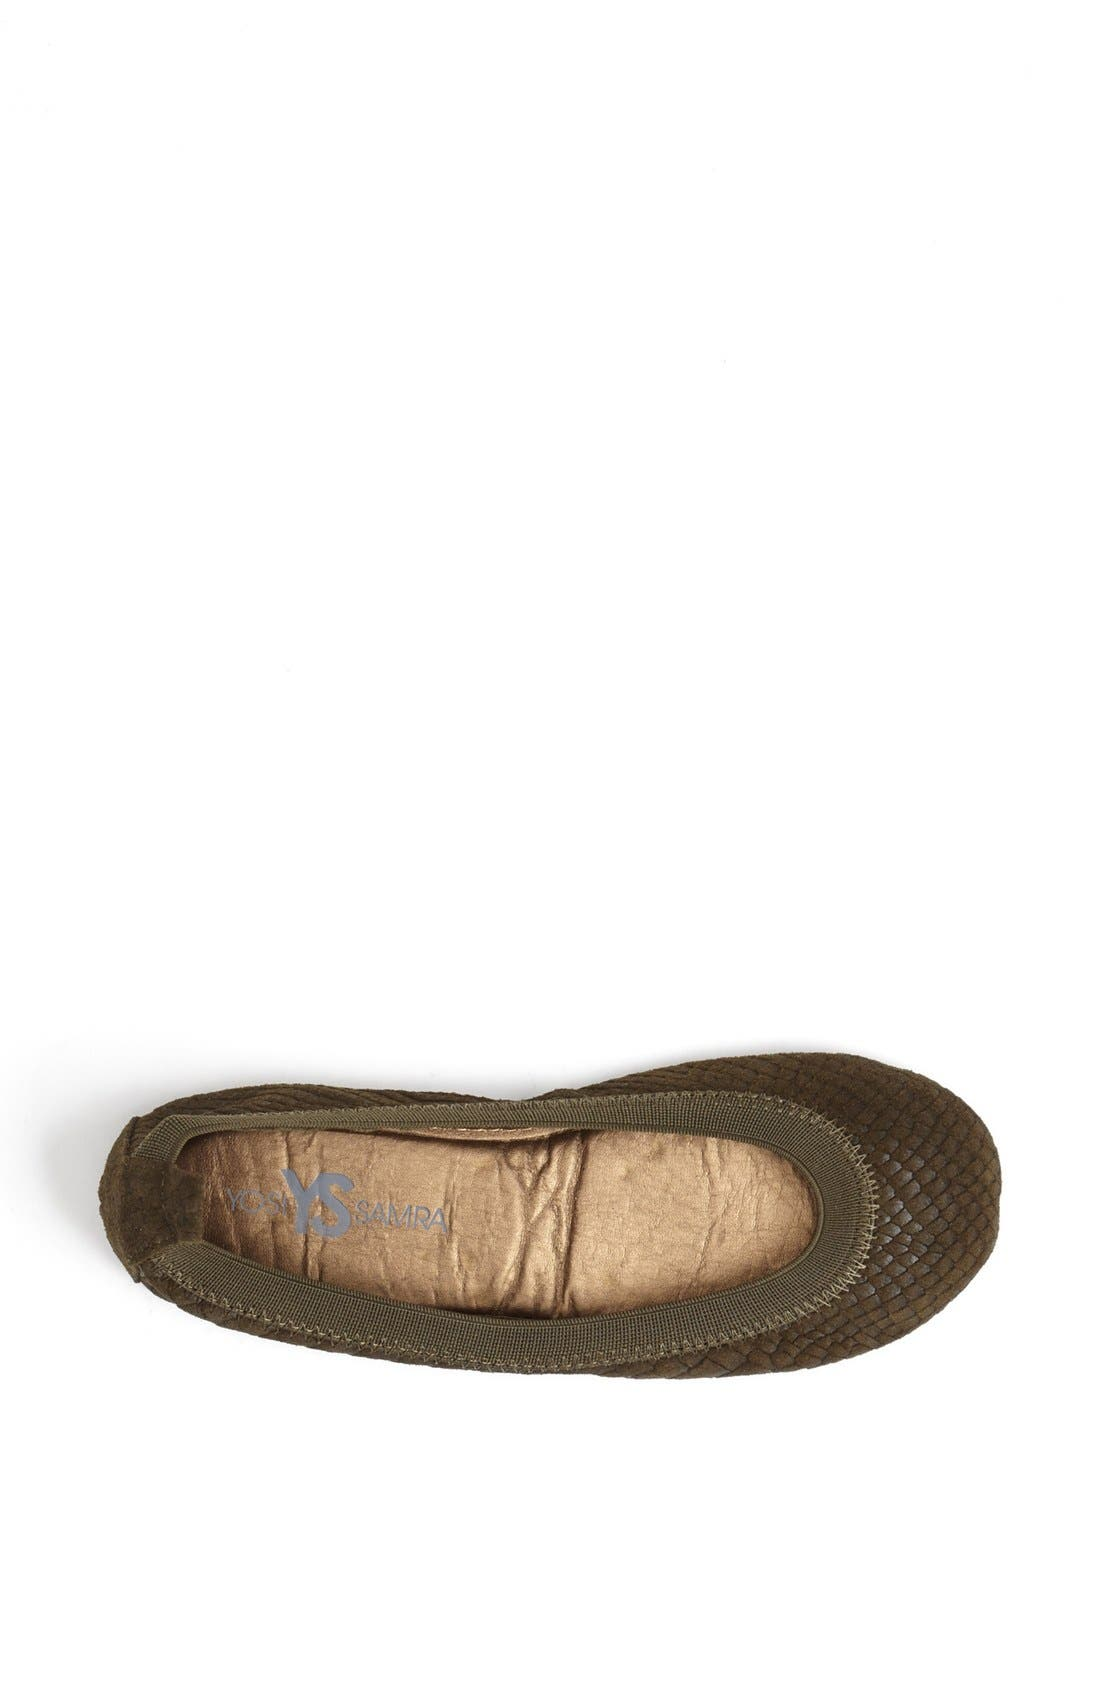 Alternate Image 3  - Yosi Samra Croc Embossed Foldable Ballet Flat